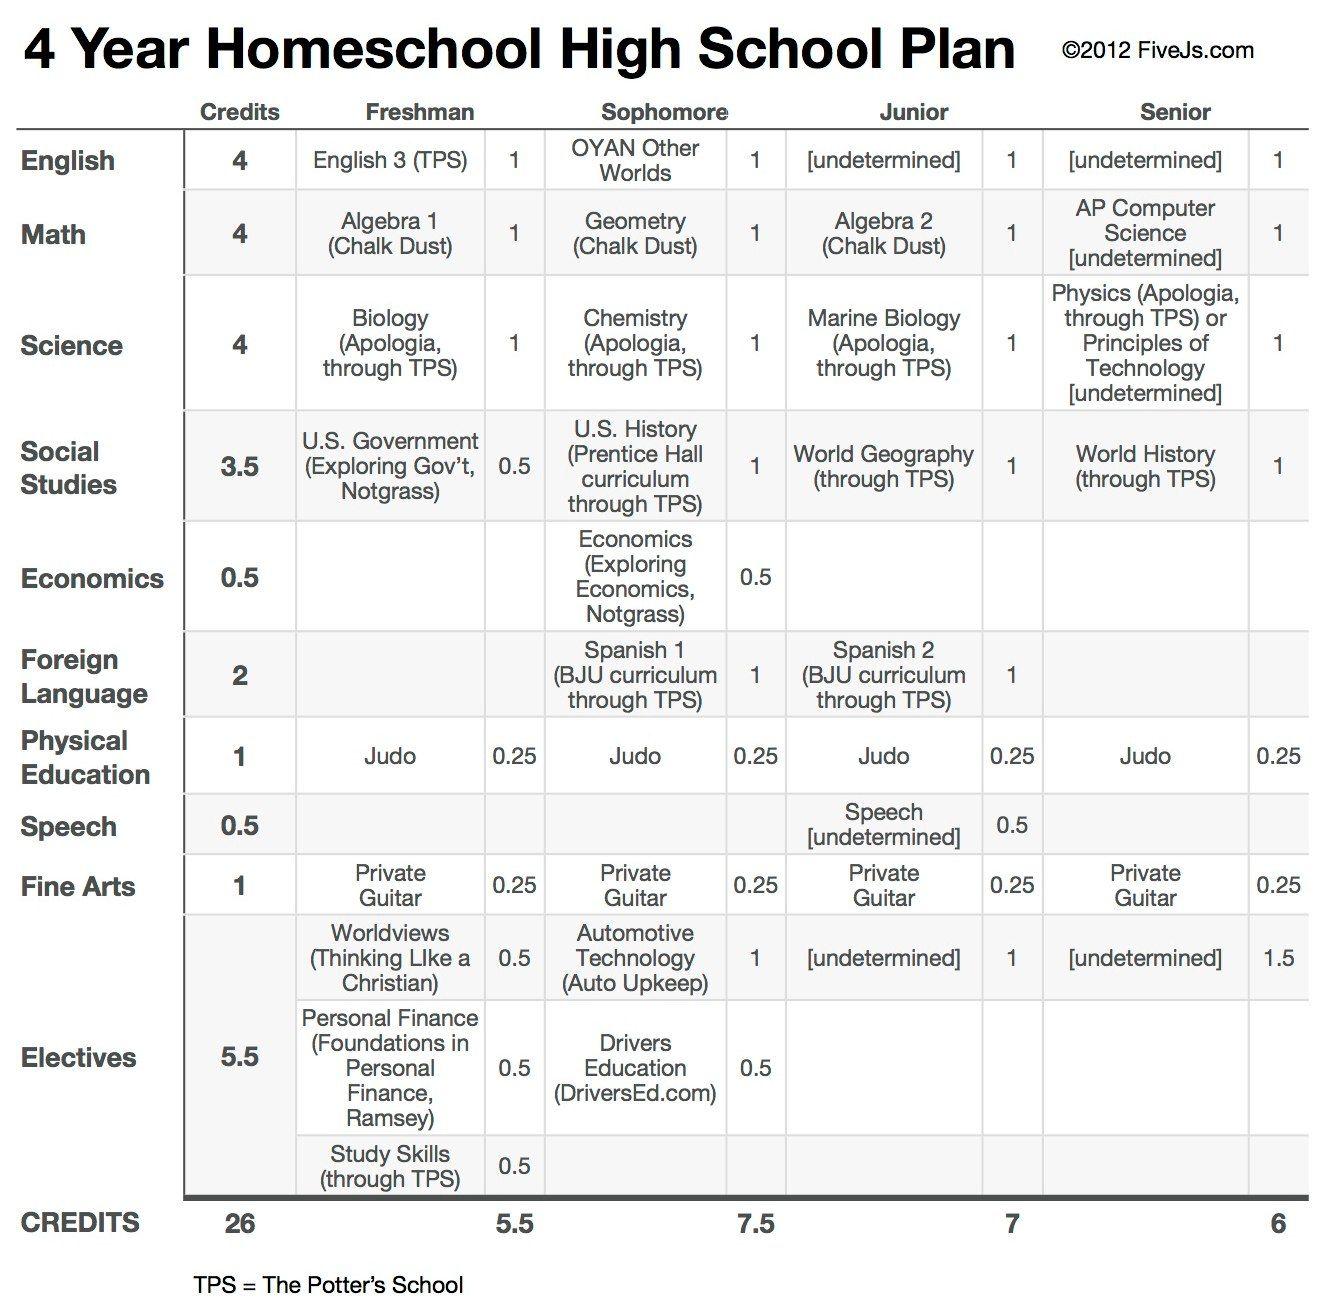 Our 10th Grade Homeschool High School Curriculum Plan